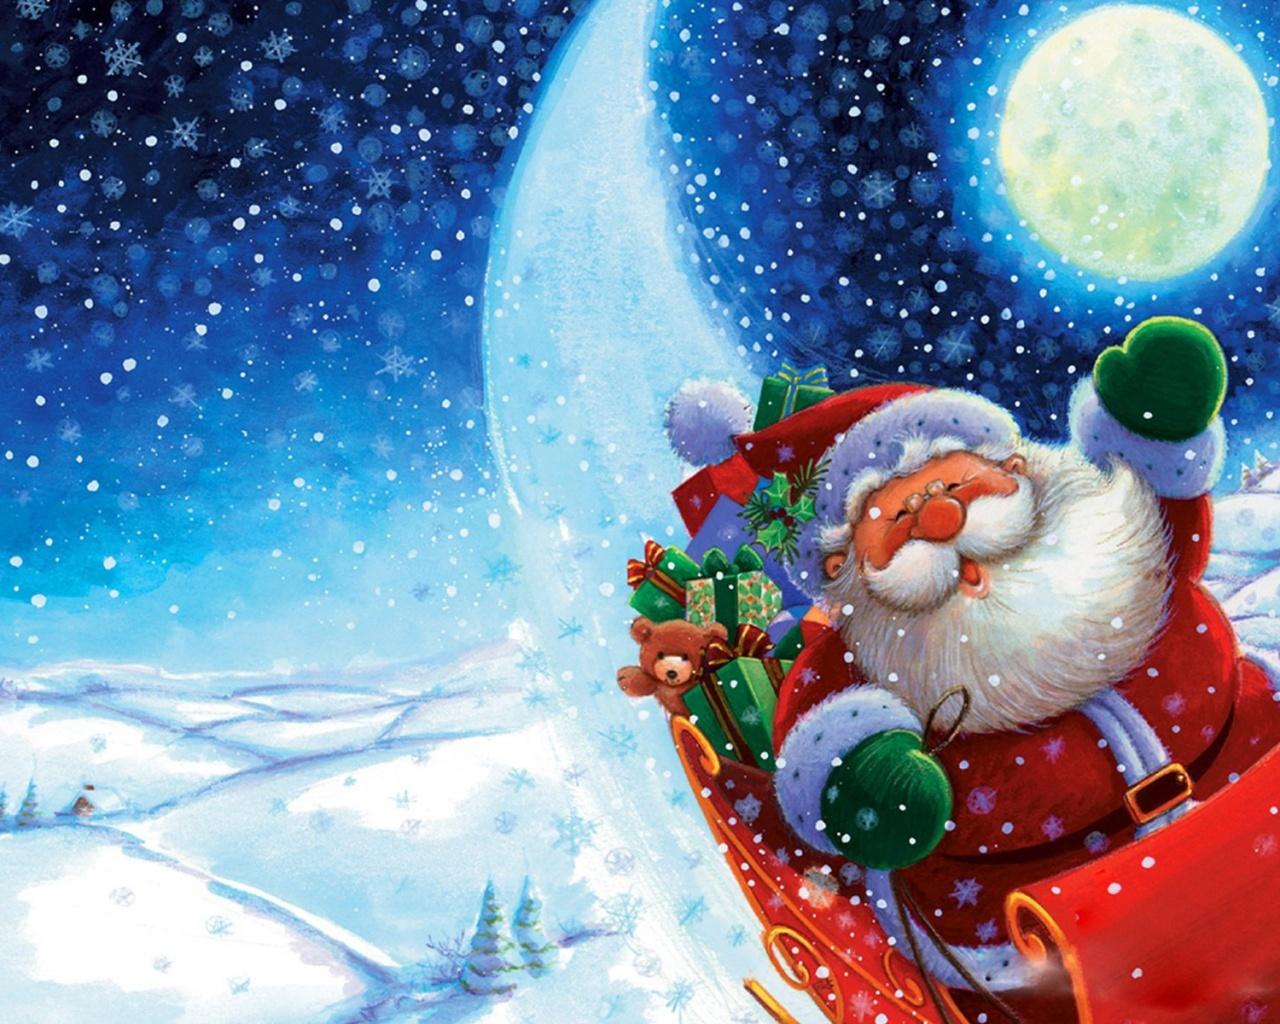 Santa wallpaper free